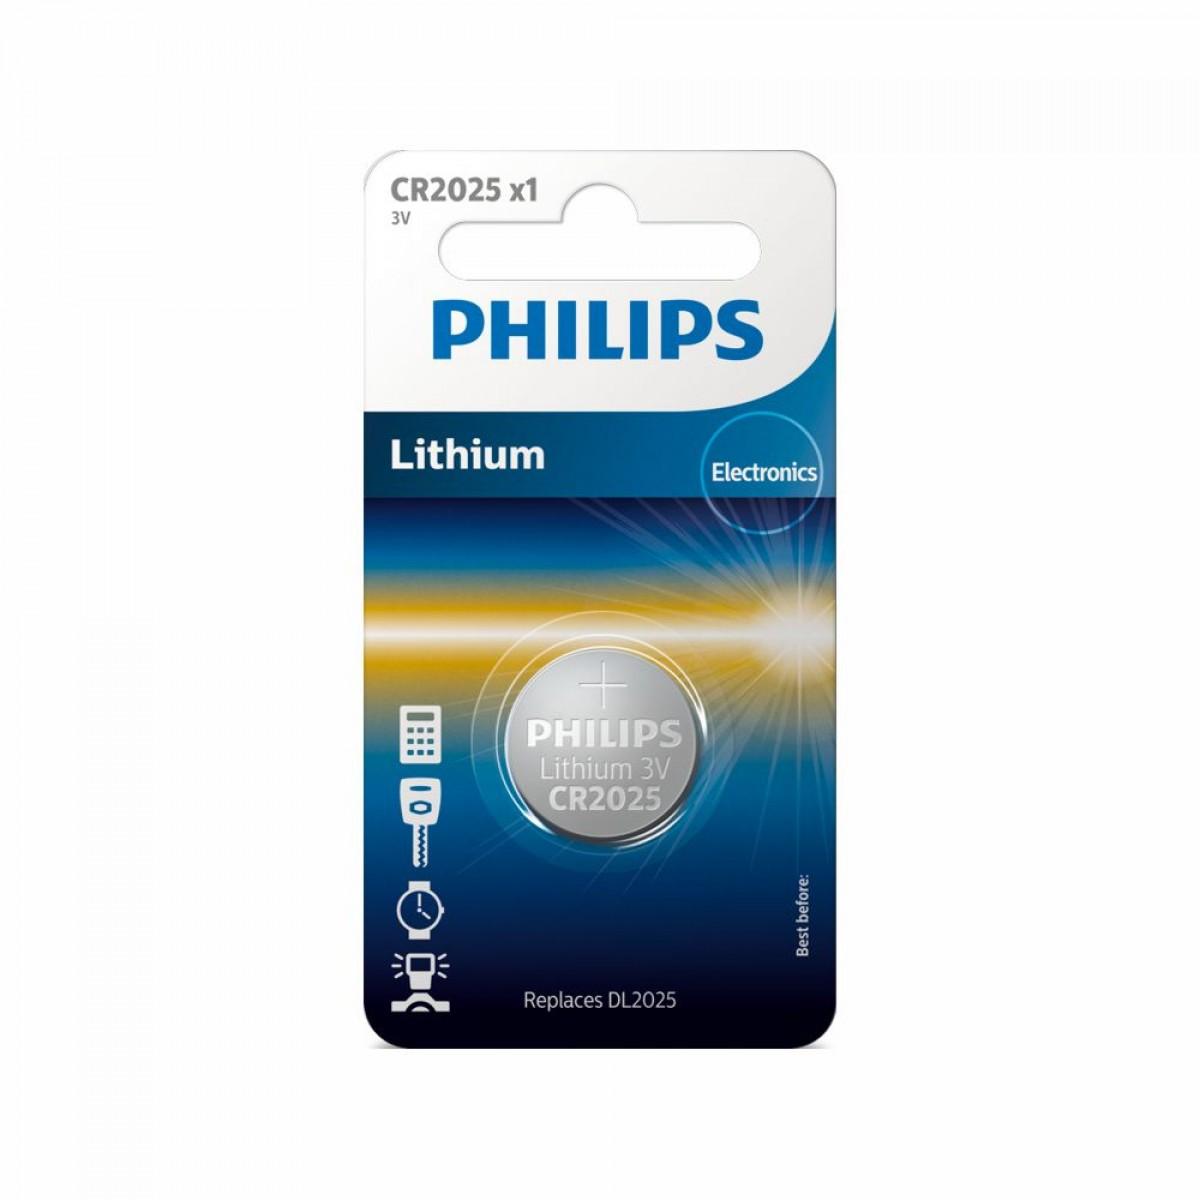 PHILIPS Batteri CR2025